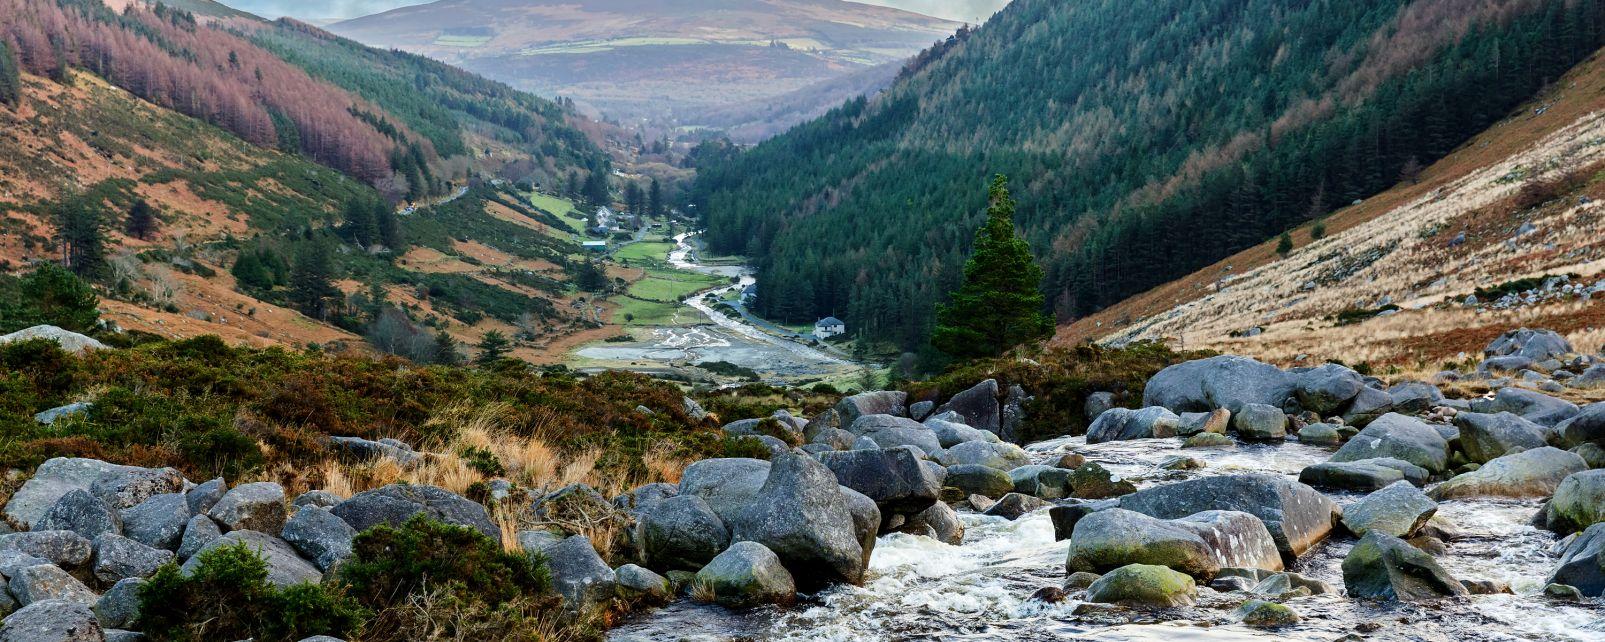 Les montagnes granitiques de Wicklow, Irlande, Les montagnes granitiques de Wicklow, Les paysages, Dublin, Irlande